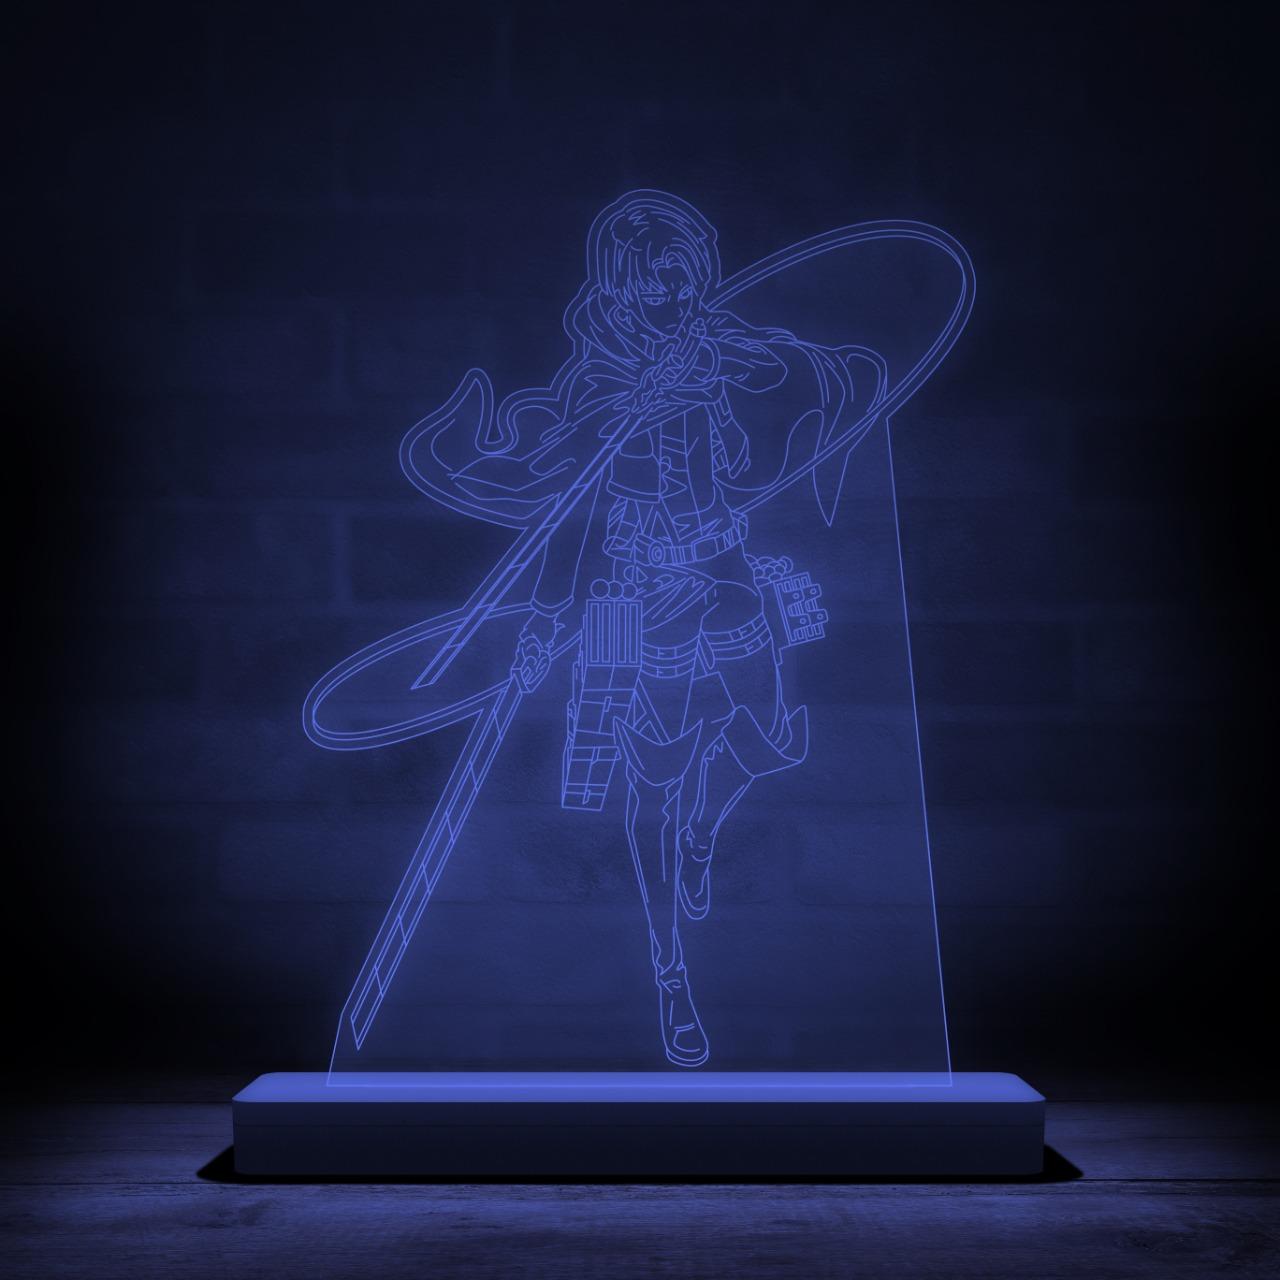 Luminária/Abajur Levi Ackerman Posição de Batalha: Attack On Titan Shingeki no Kyojin - Anime Mangá - EV